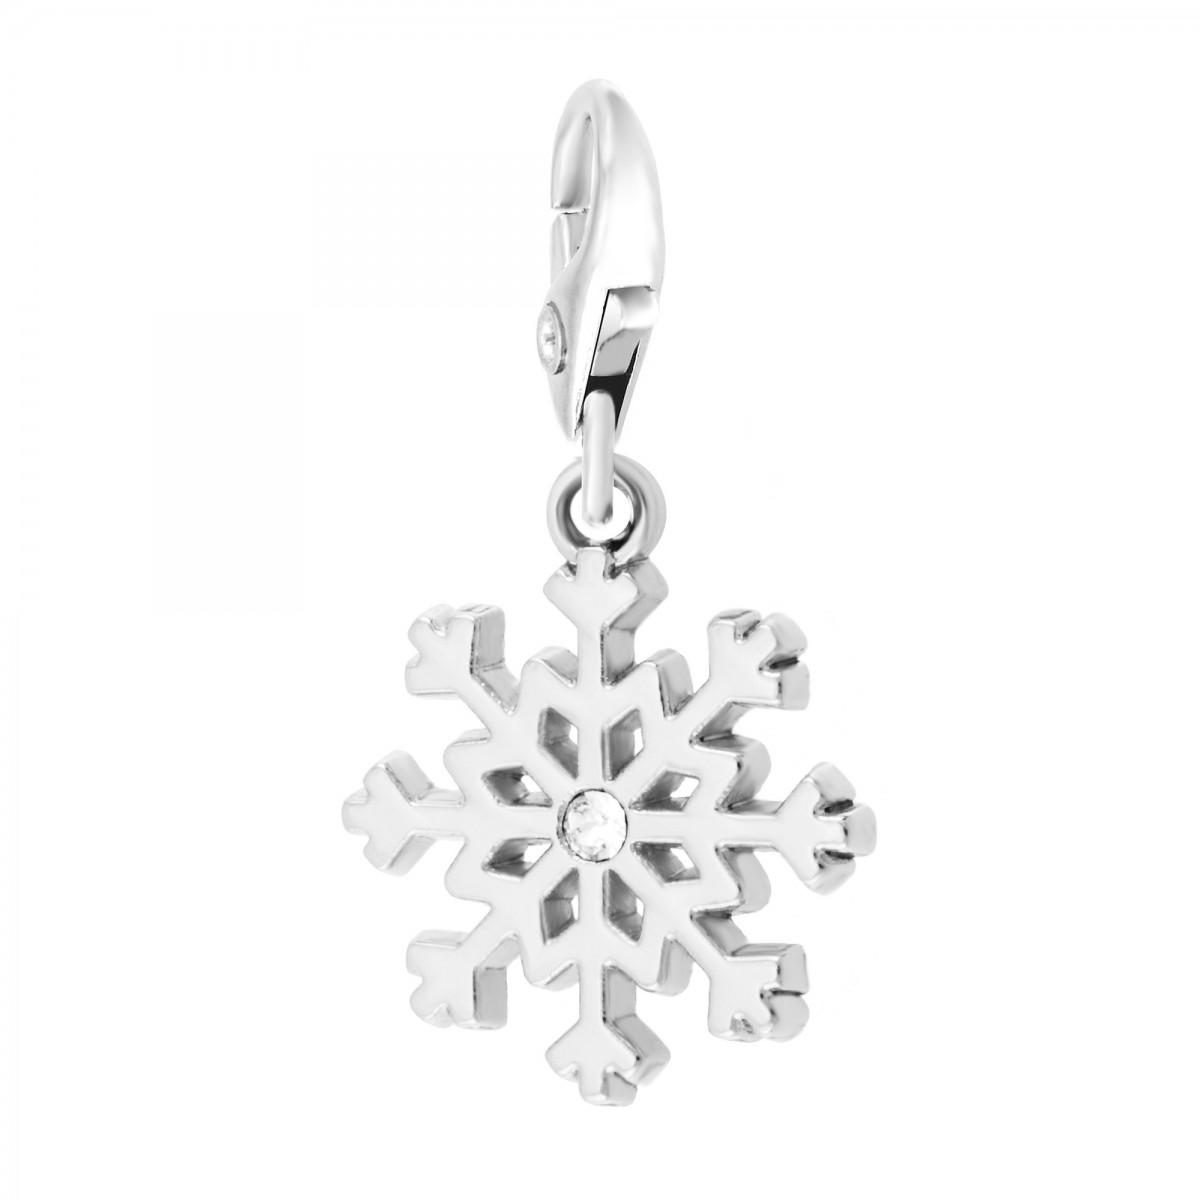 Charm Flocon de neige So Charm made with Crystal from Swarovski